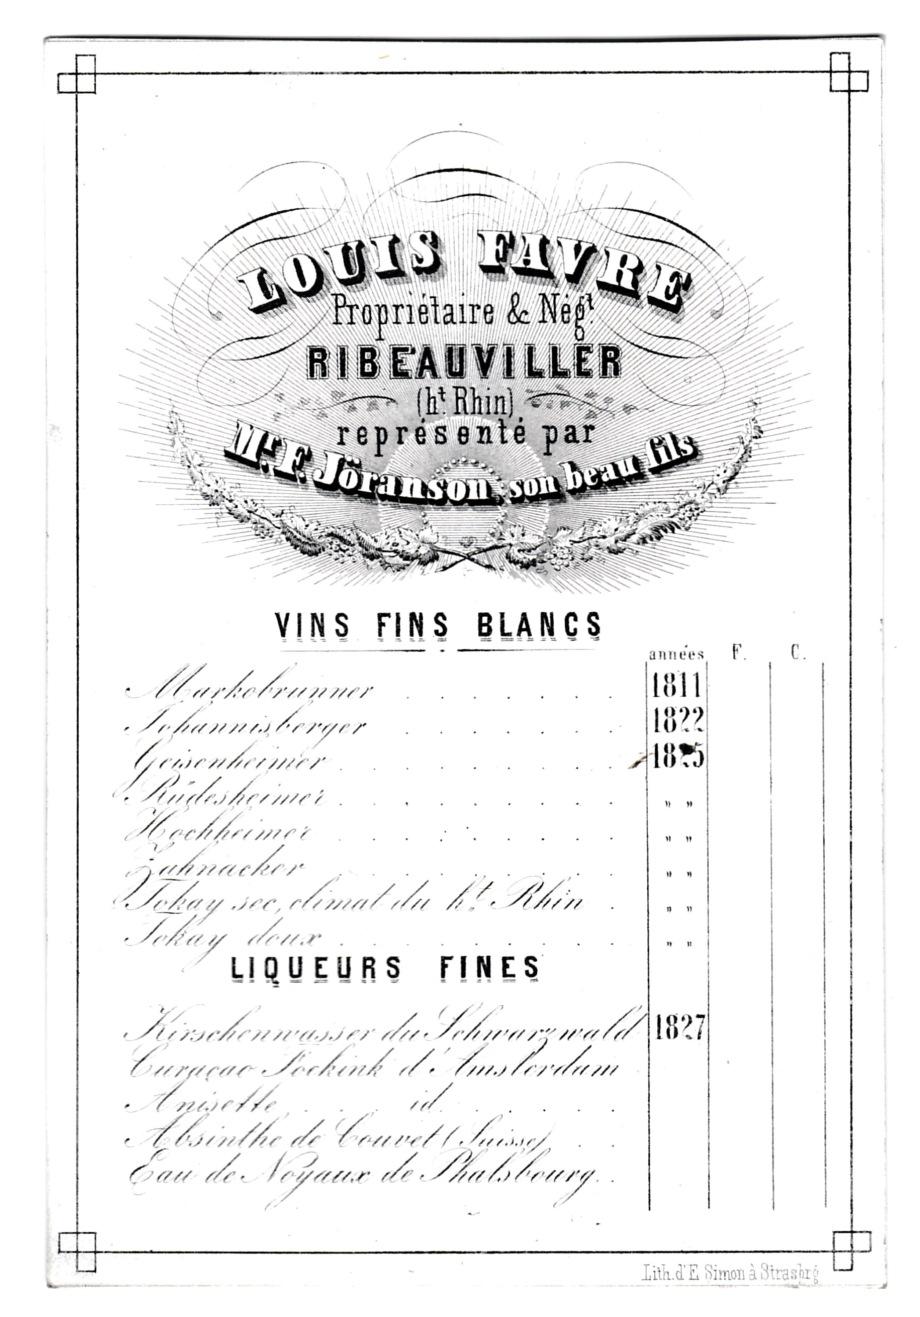 1811-1827, Tarif Vins Alsace Jules FAVRE à Ribeauviller ex H. Laigle, Litho E. Simon à Strasbourg